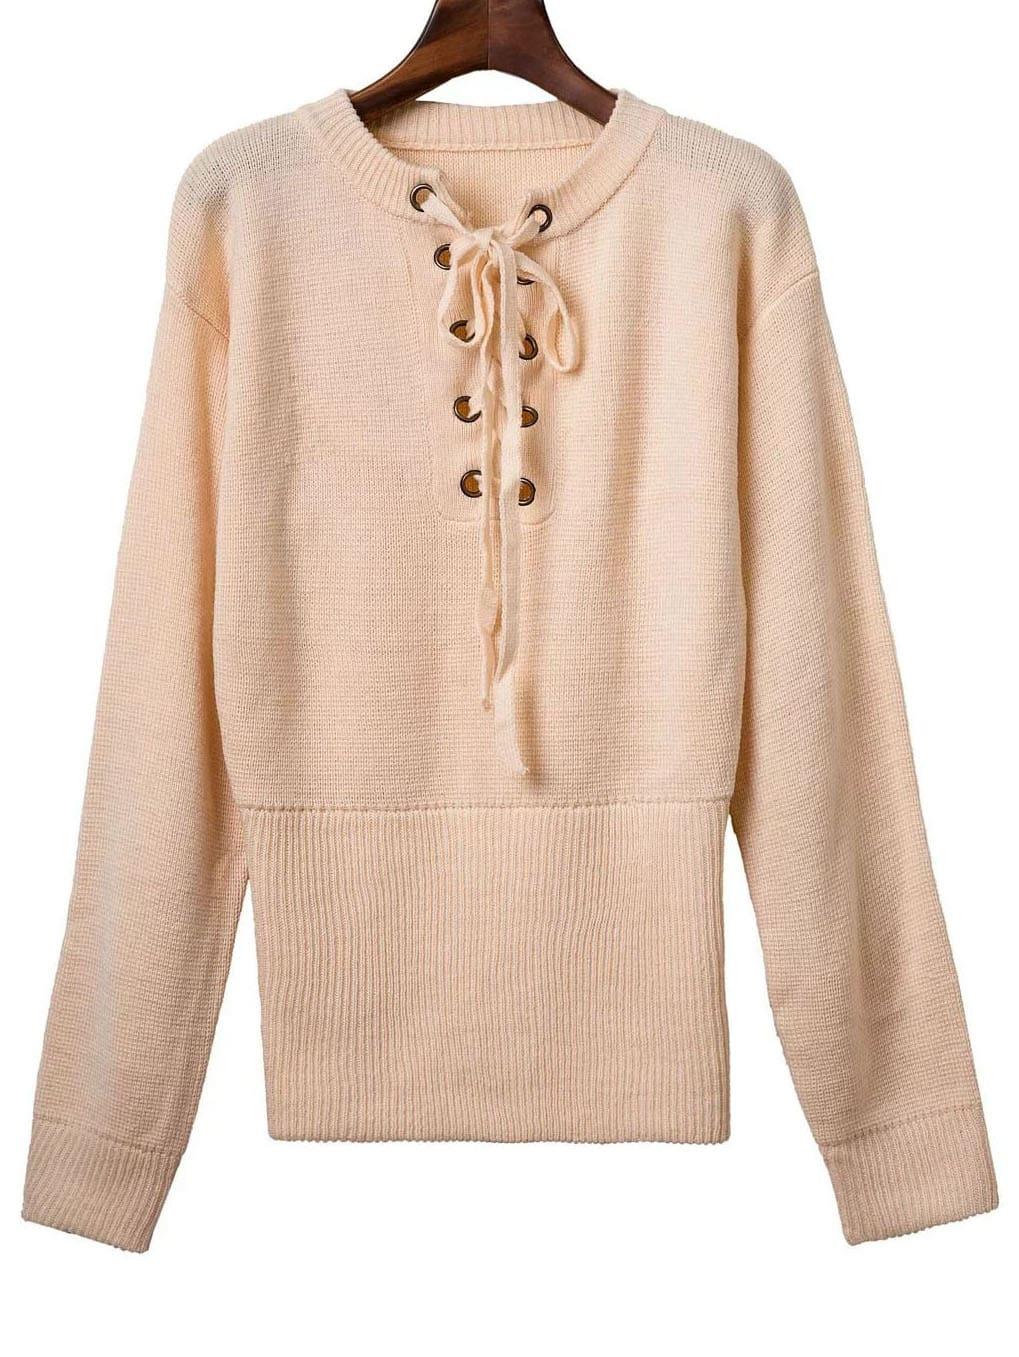 Khaki Ribbed Cuff Wide Hem Lace Up Sweater sweater160805205